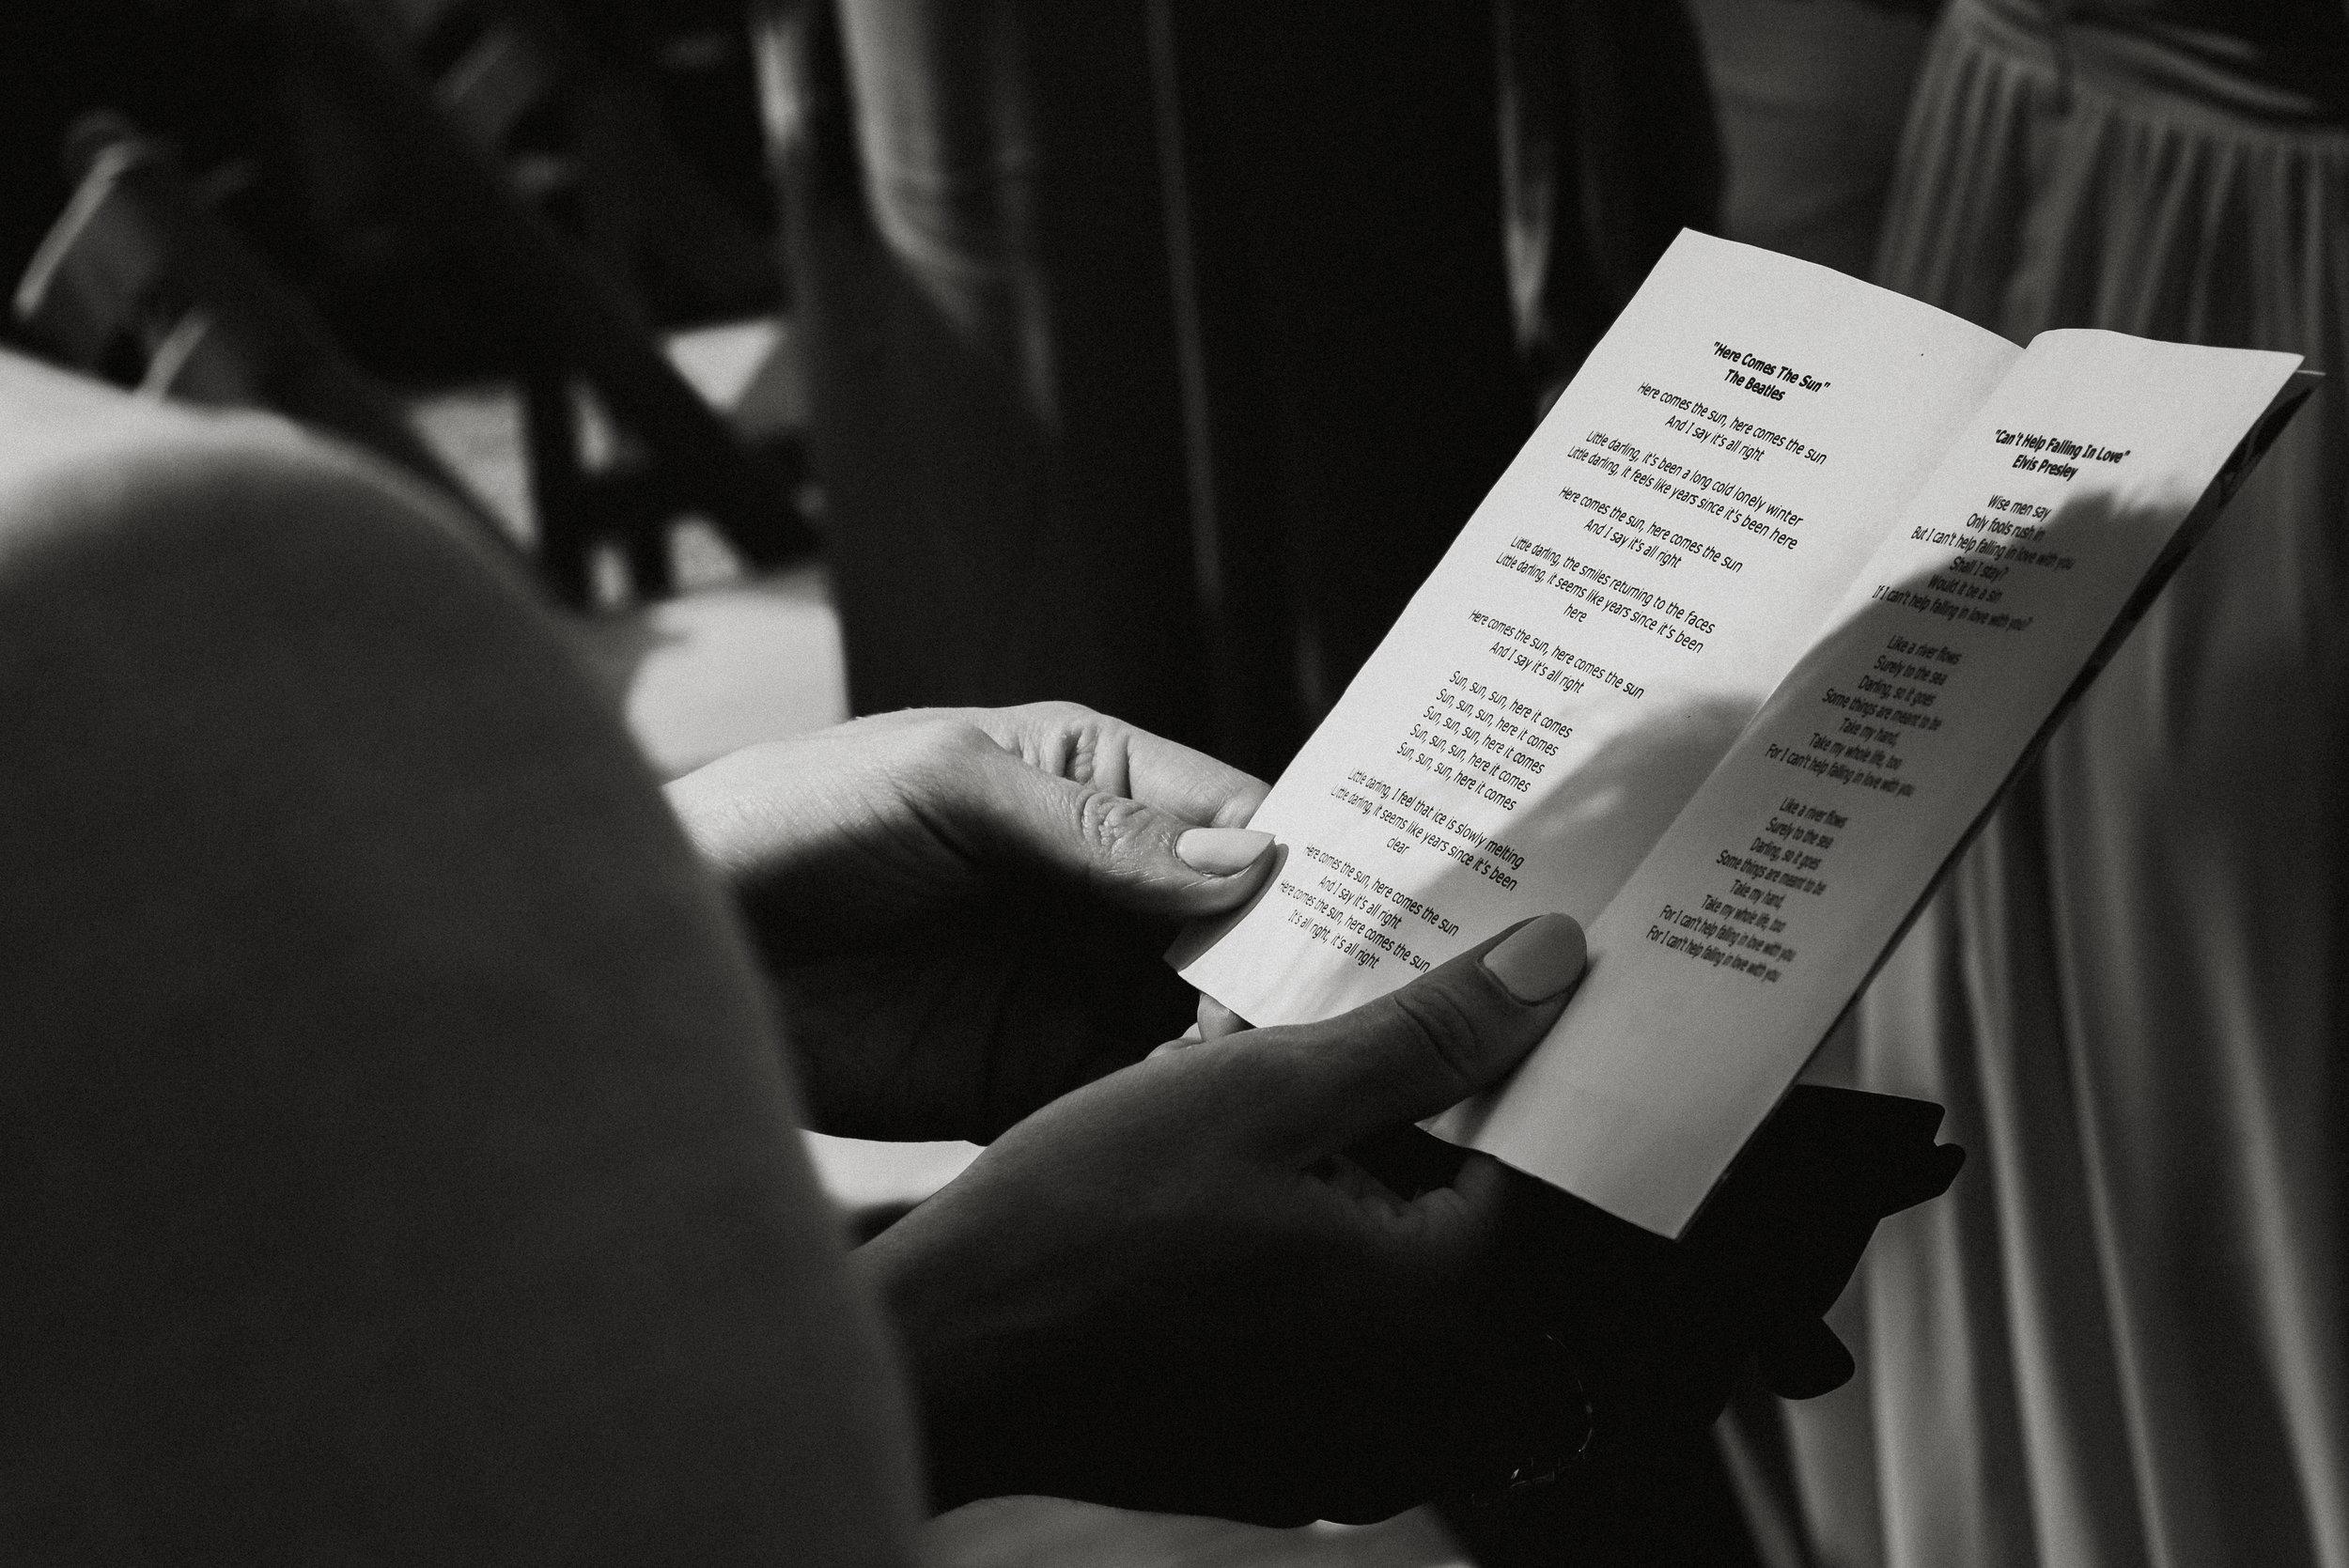 pencarrow-house-wedding-photographer-51.jpg